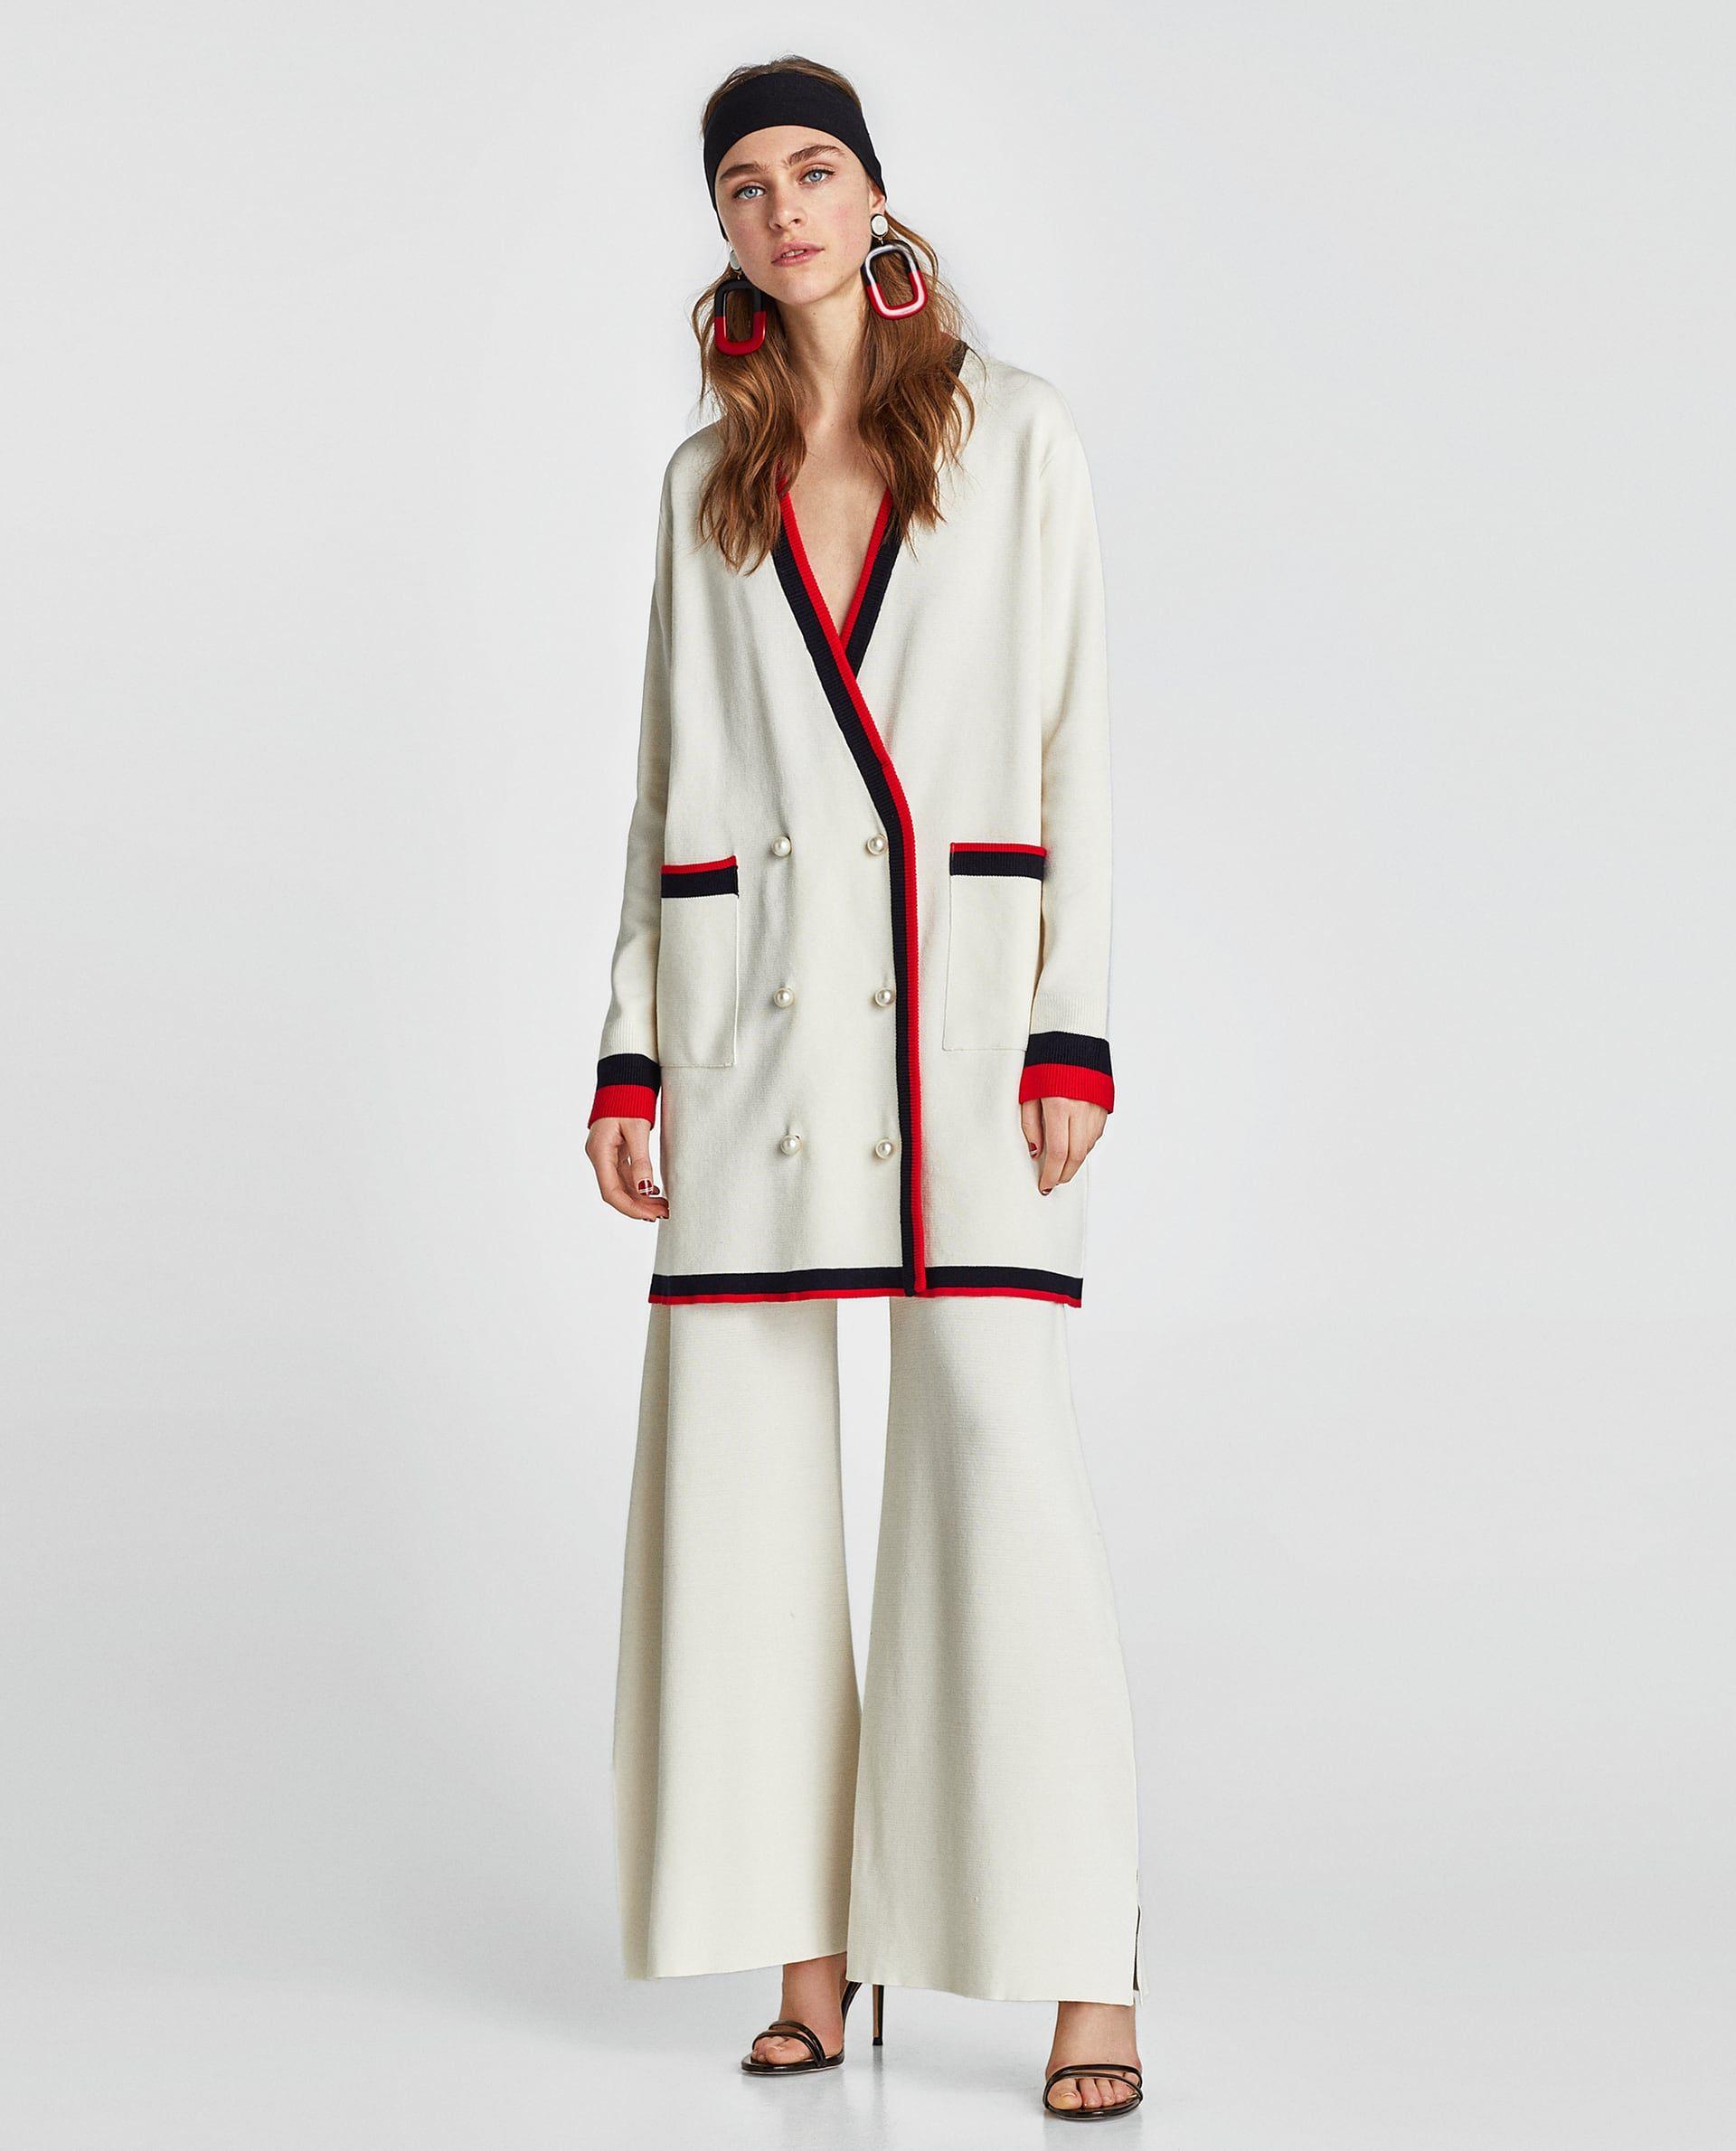 664651dd CHAQUETA CRUZADA PERLA | COZY COOL | Double breasted jacket, Jackets ...